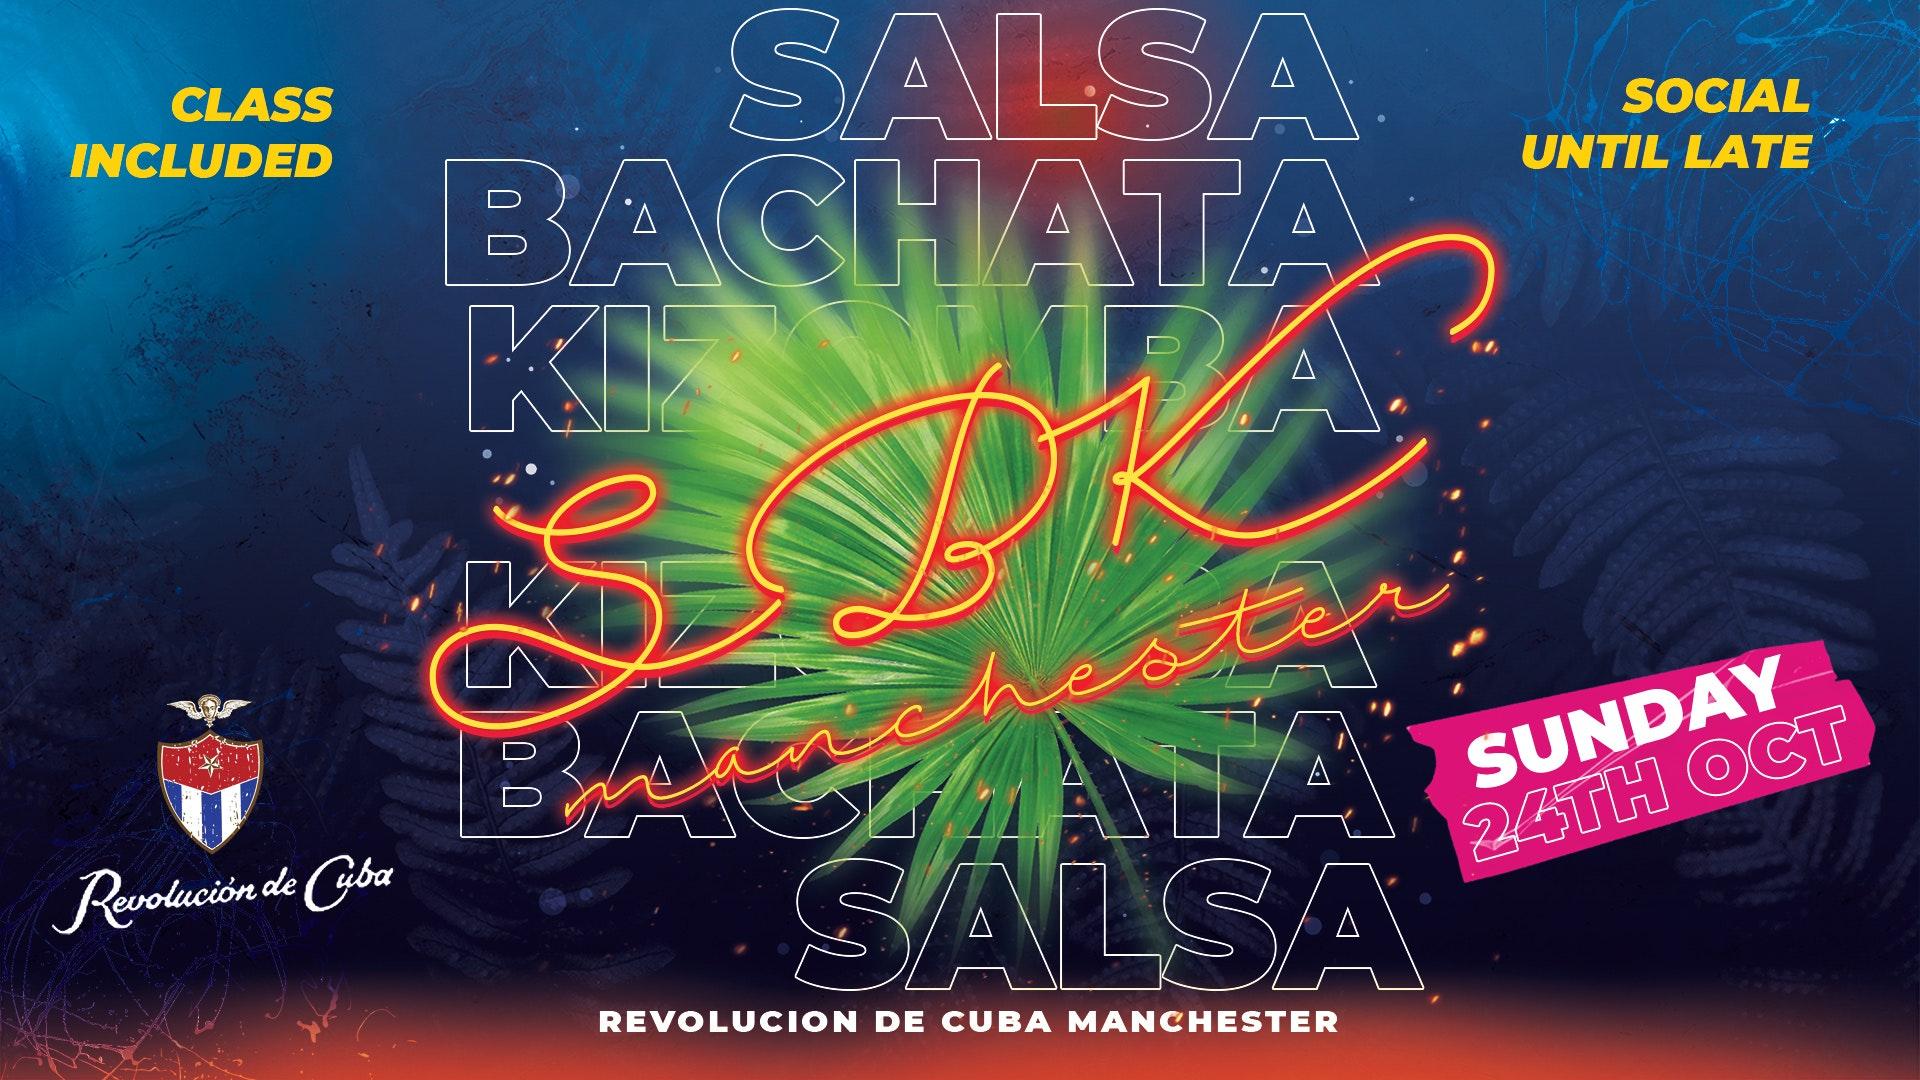 SBK MANCHESTER | Sunday 24th October – Revolucion de Cuba